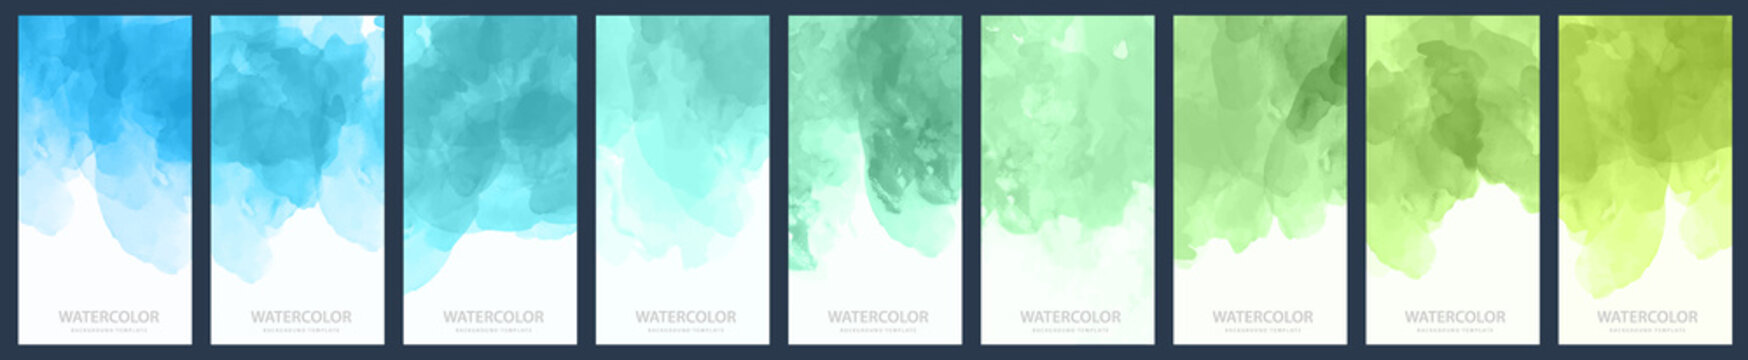 Set of light green-blue gradient vector watercolor vertical backgrounds for poster, banner or flyer